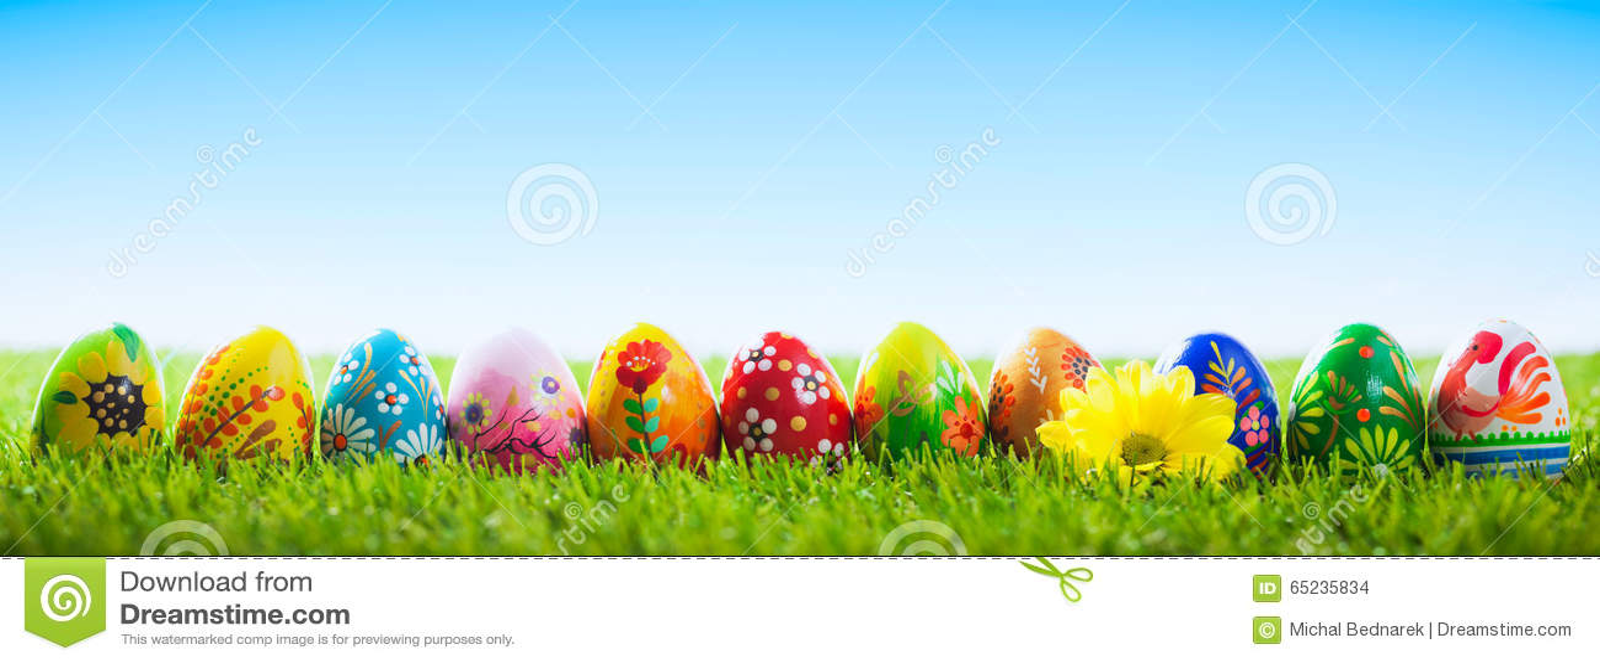 Красочной покрашенные рукой пасхальные яйца на траве Знамя, панорамное